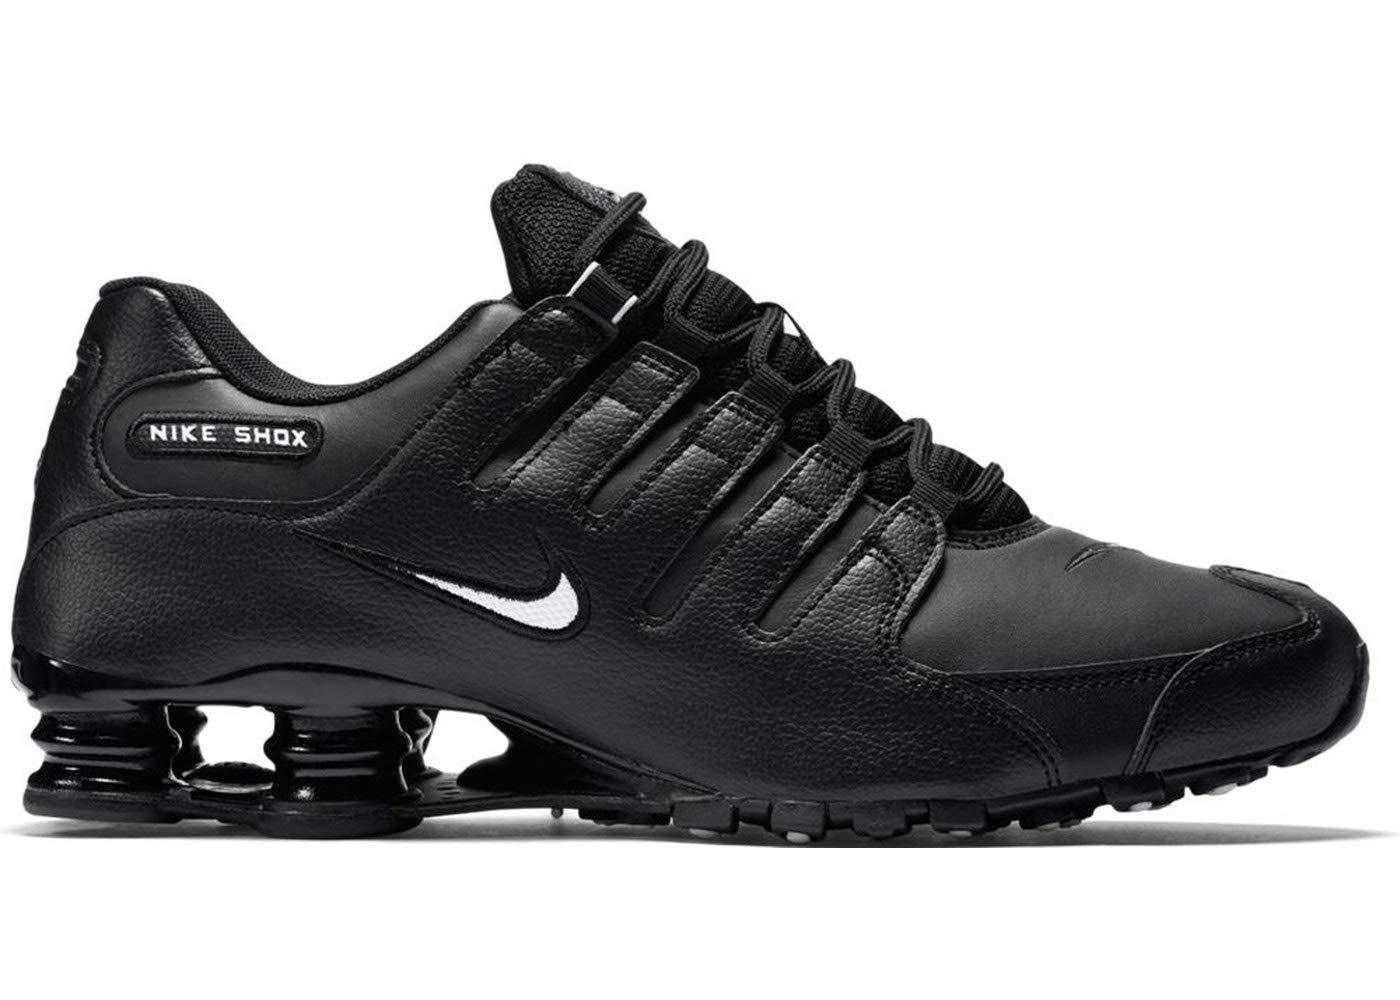 check out 6e298 bf350 Nike Men's Shox NZ Running Shoe Black/White/Black - 12 D(M) US